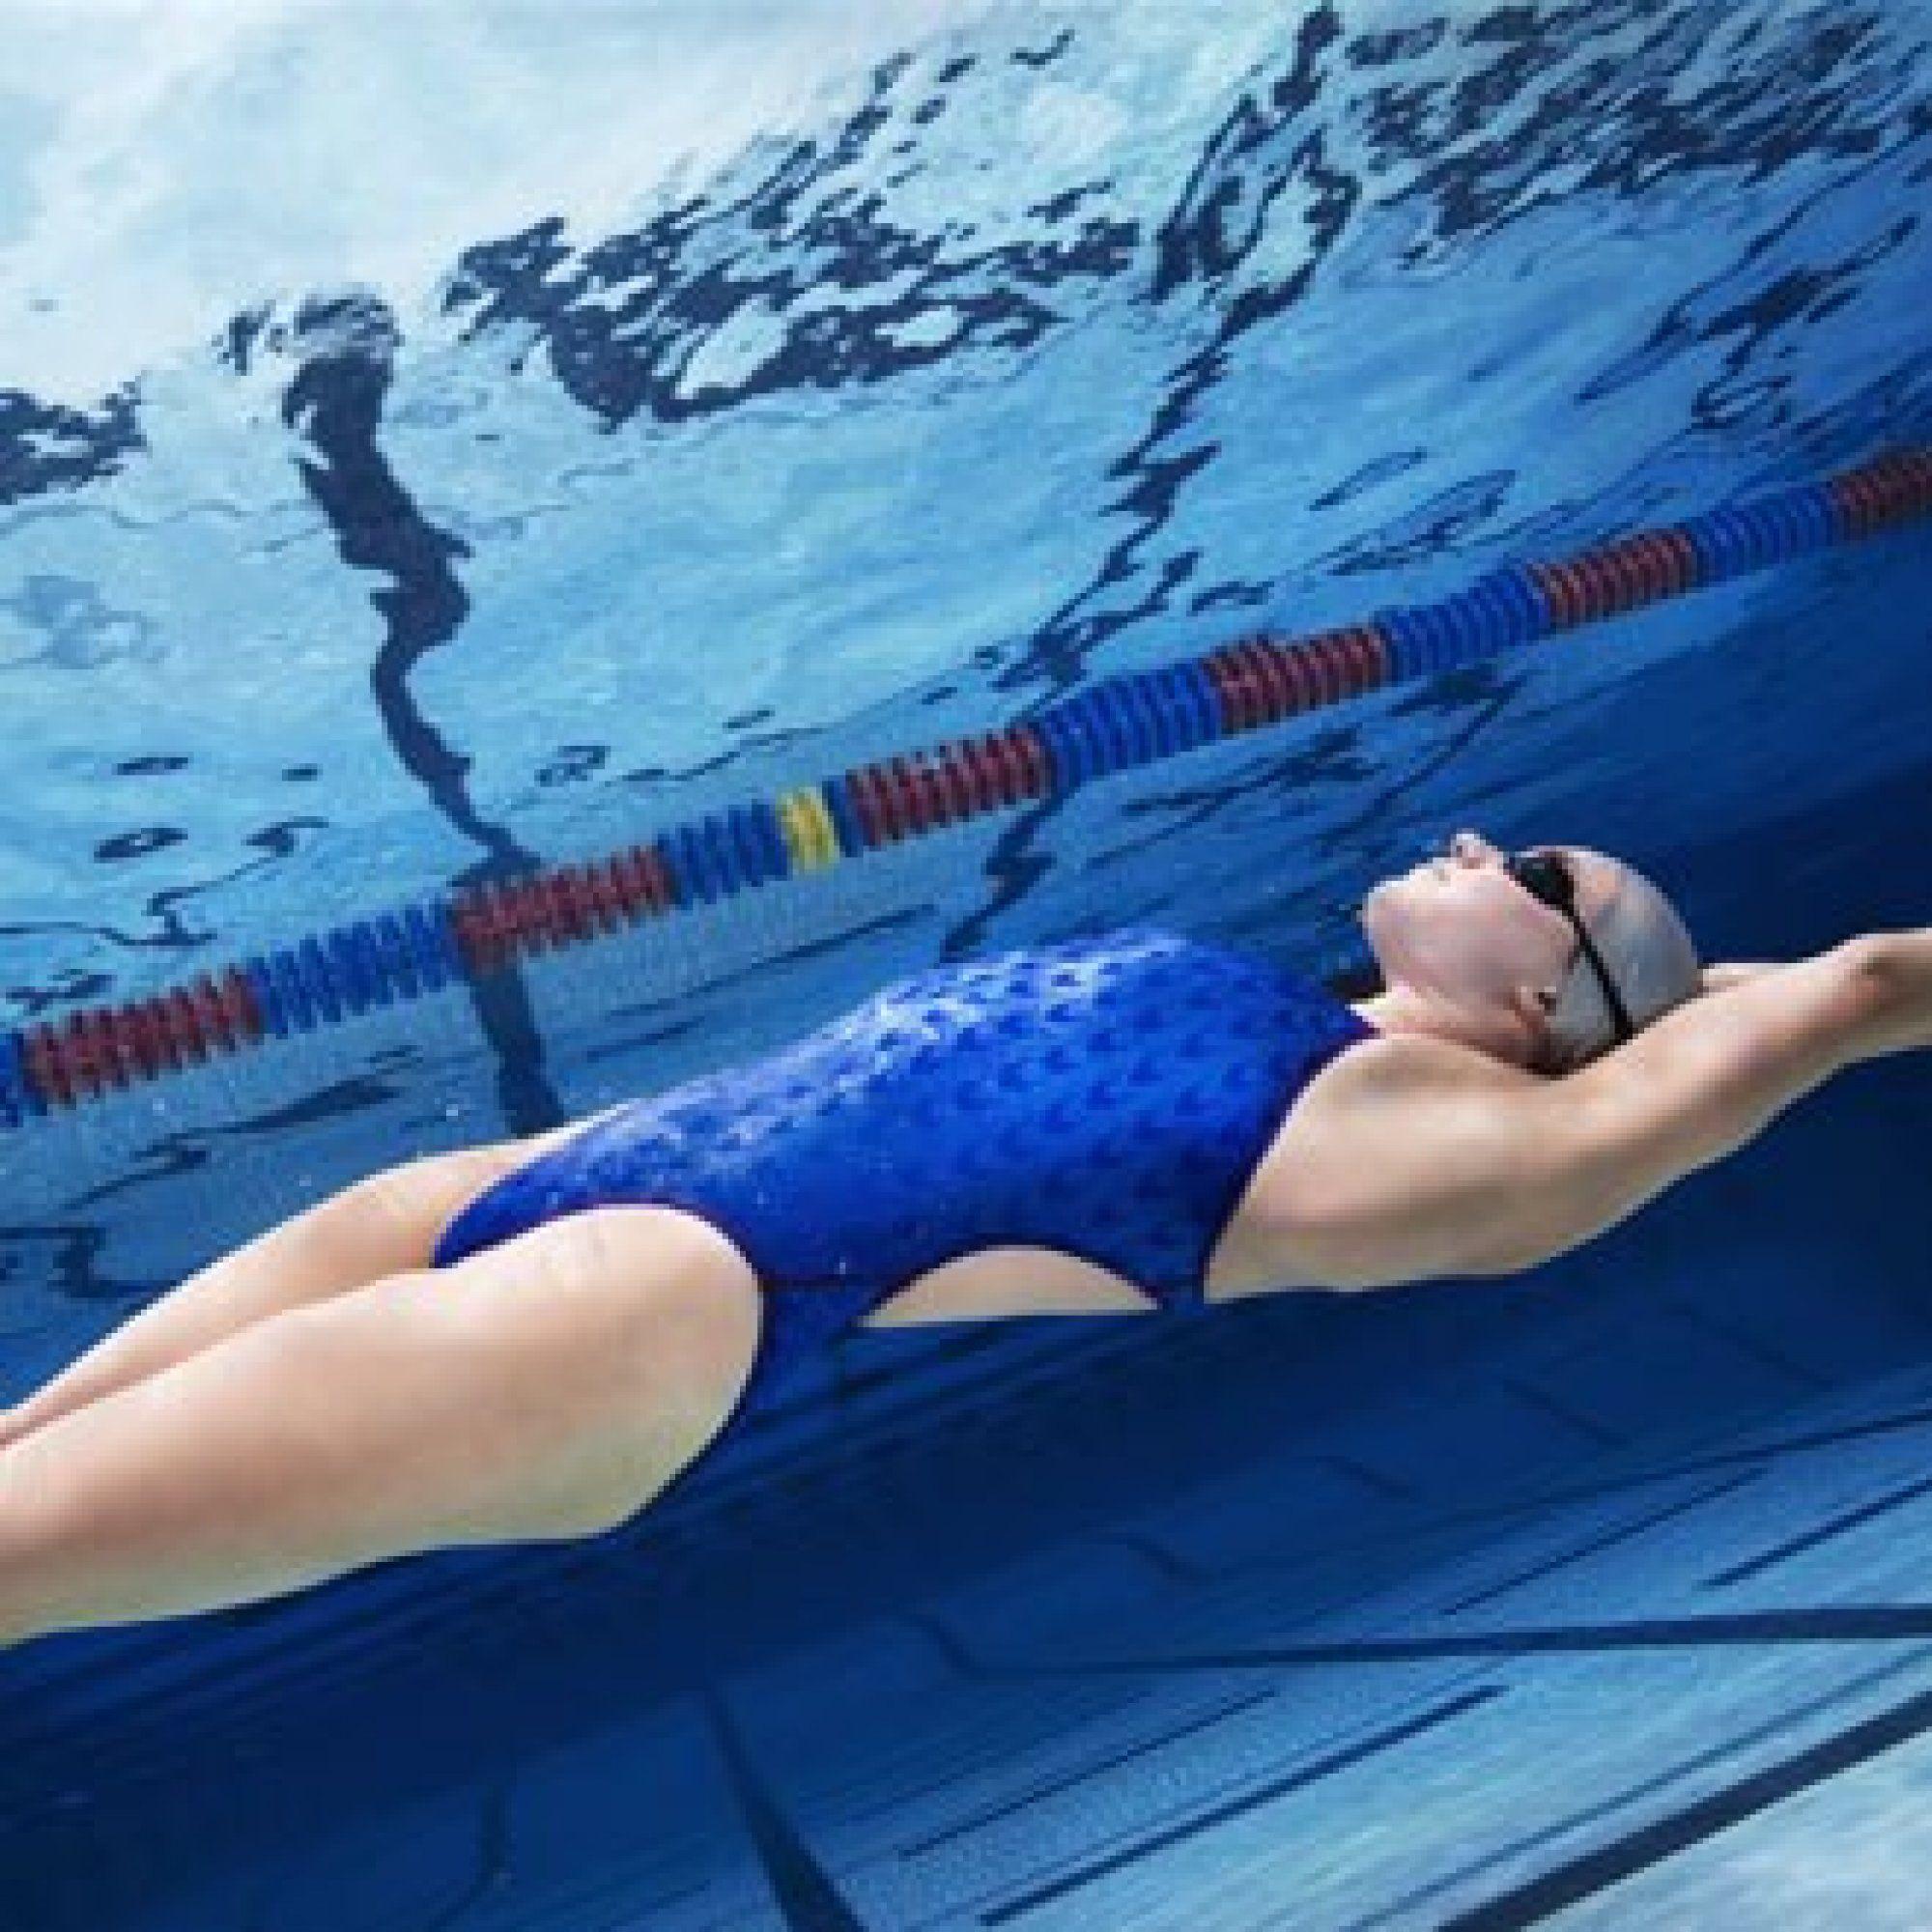 Maigrir Avec Un Programme Piscine Perso | Exercice Piscine ... concernant Musculation Piscine